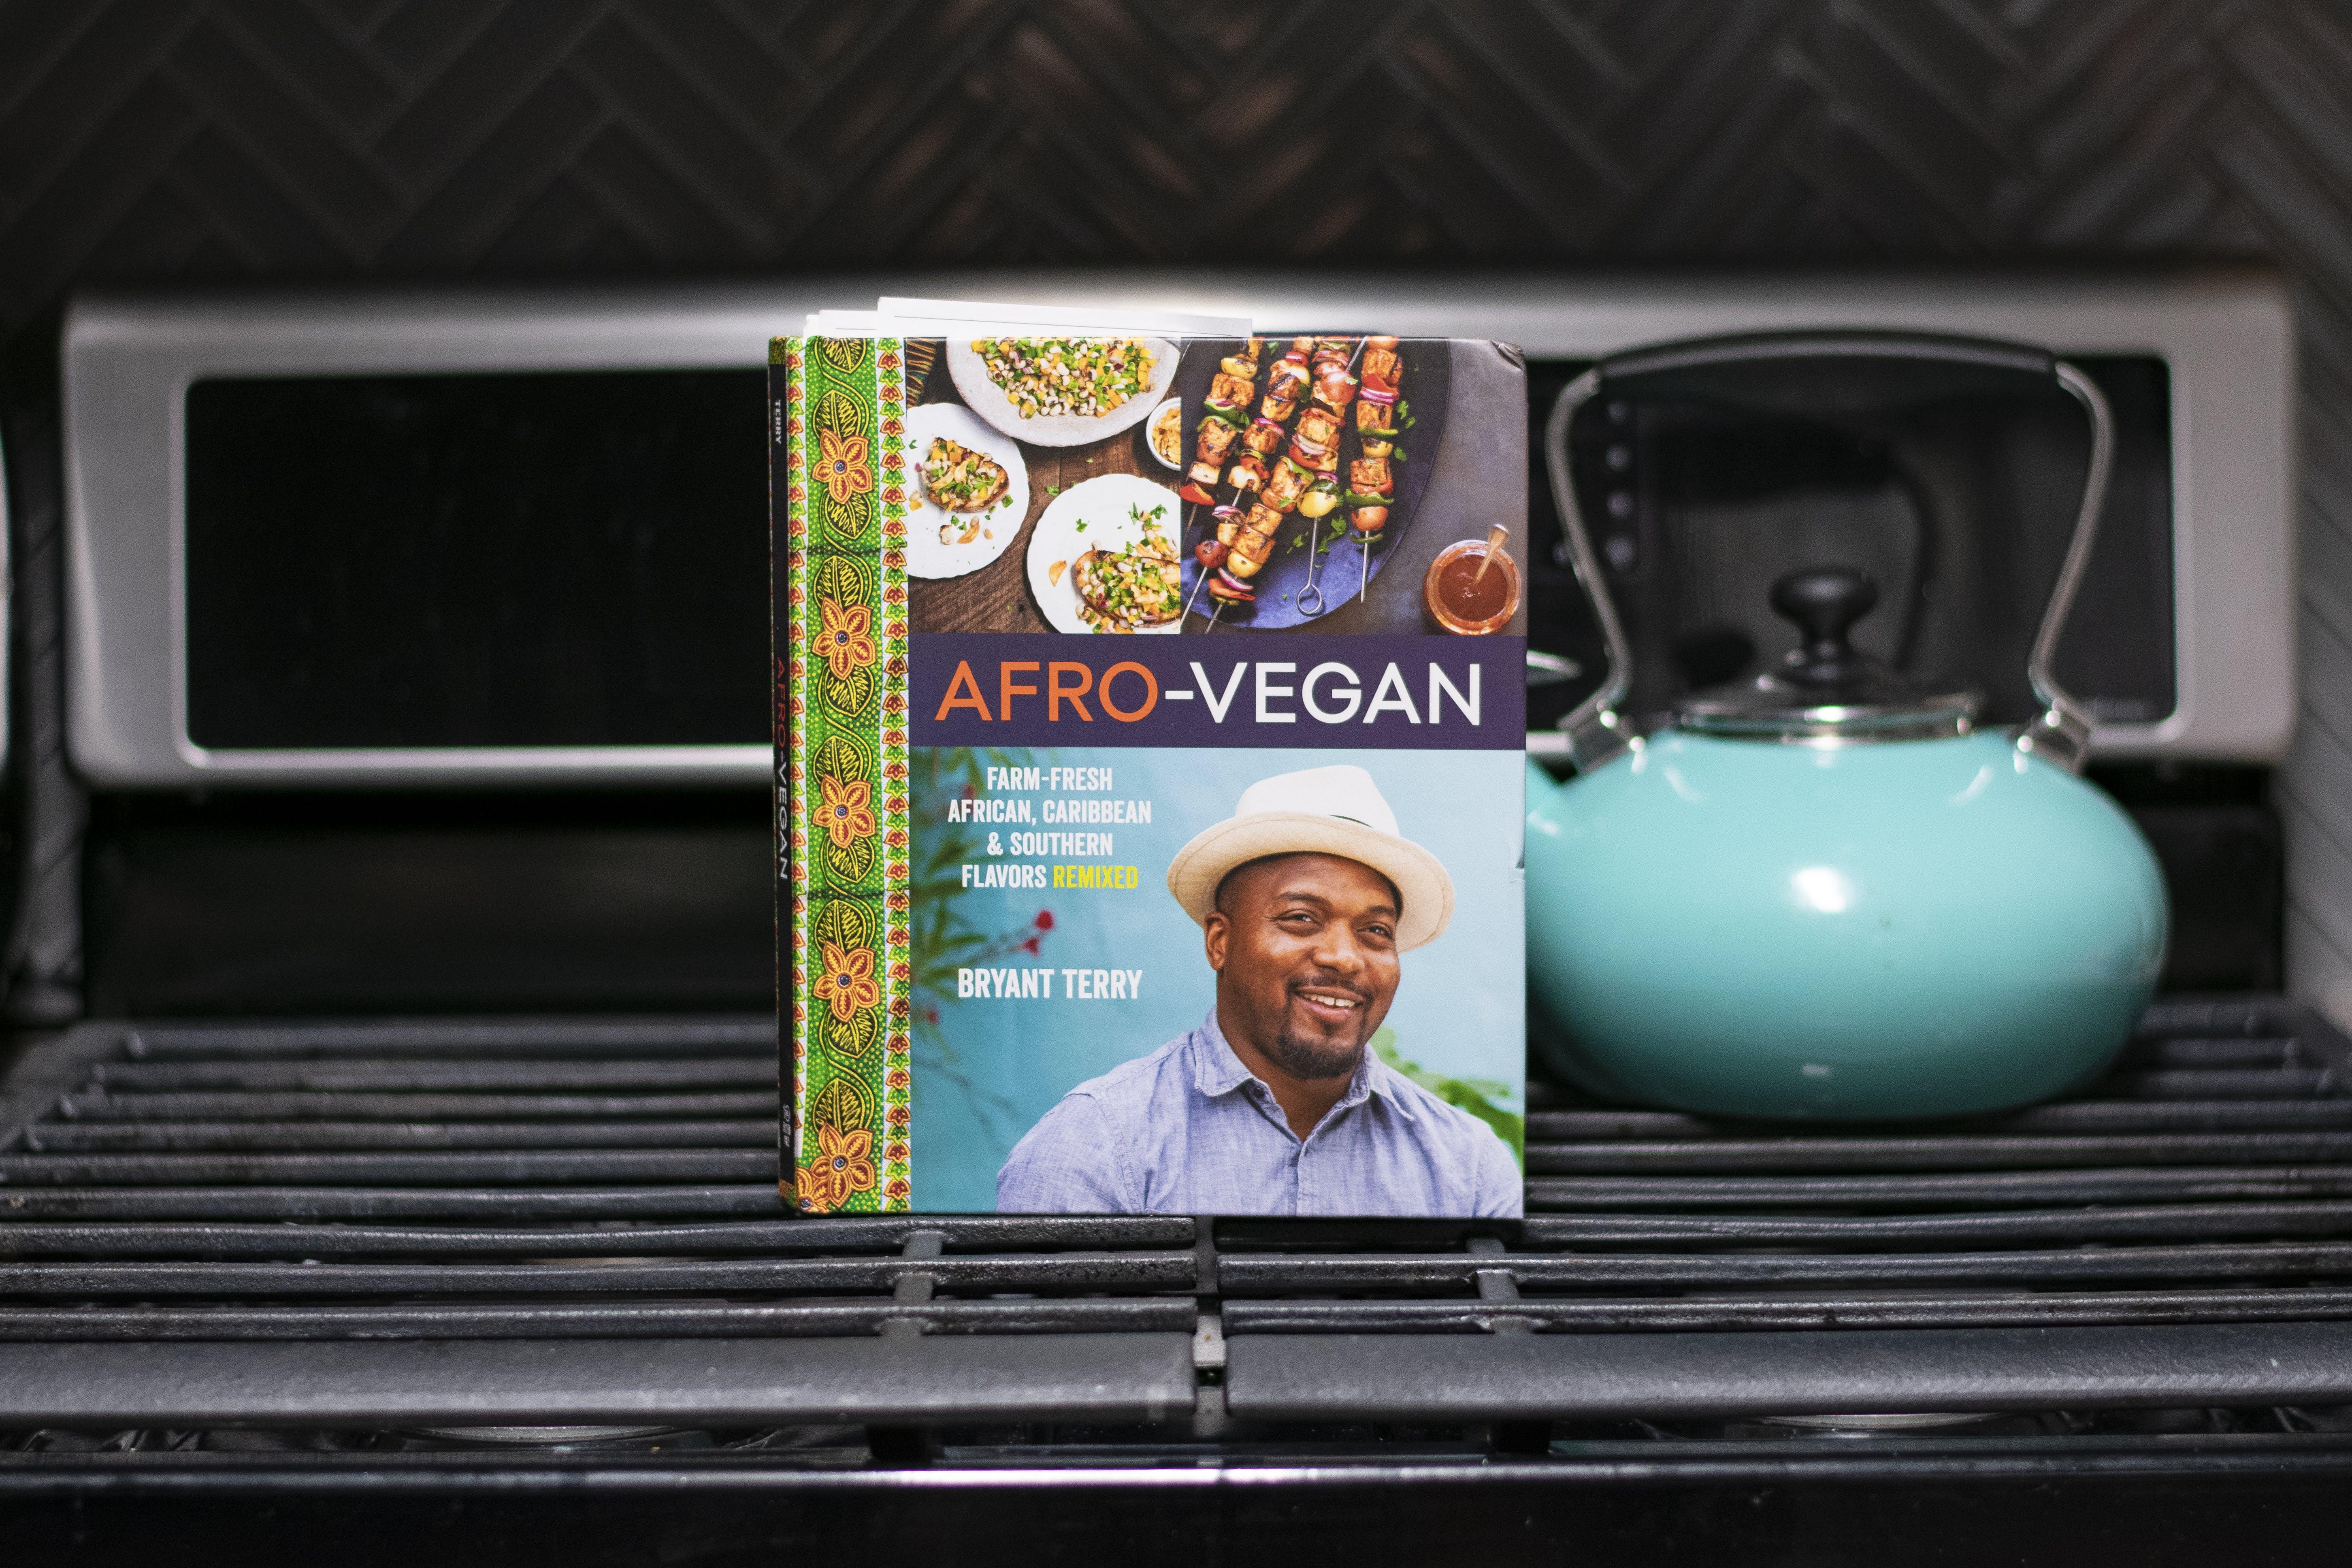 Afro-vegan Cookbook on Black Gas Range Oven